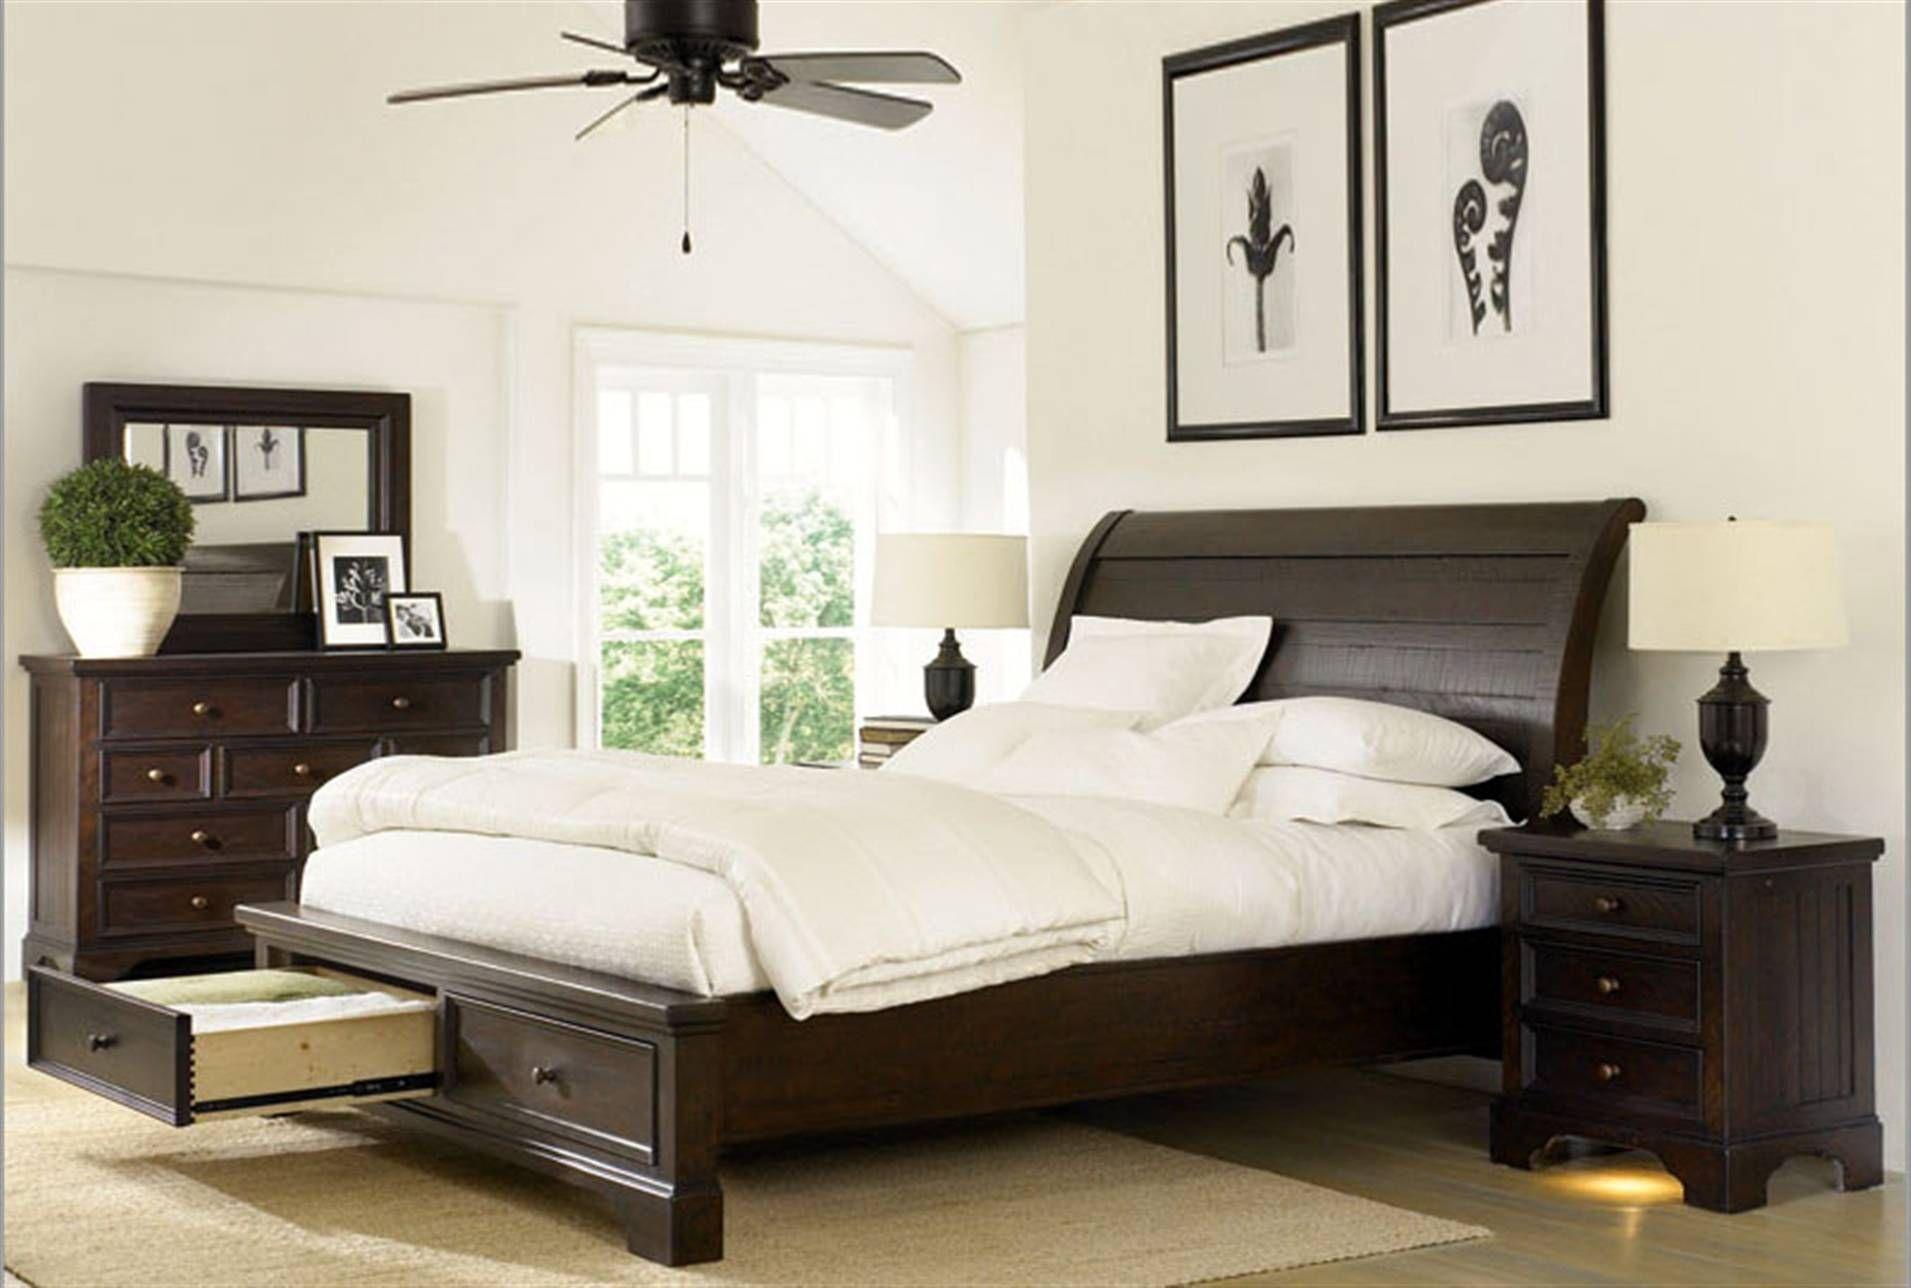 bedroom diy cal it and redecor your ellegant home interior for sets design set modern king with decor furniture make awesome